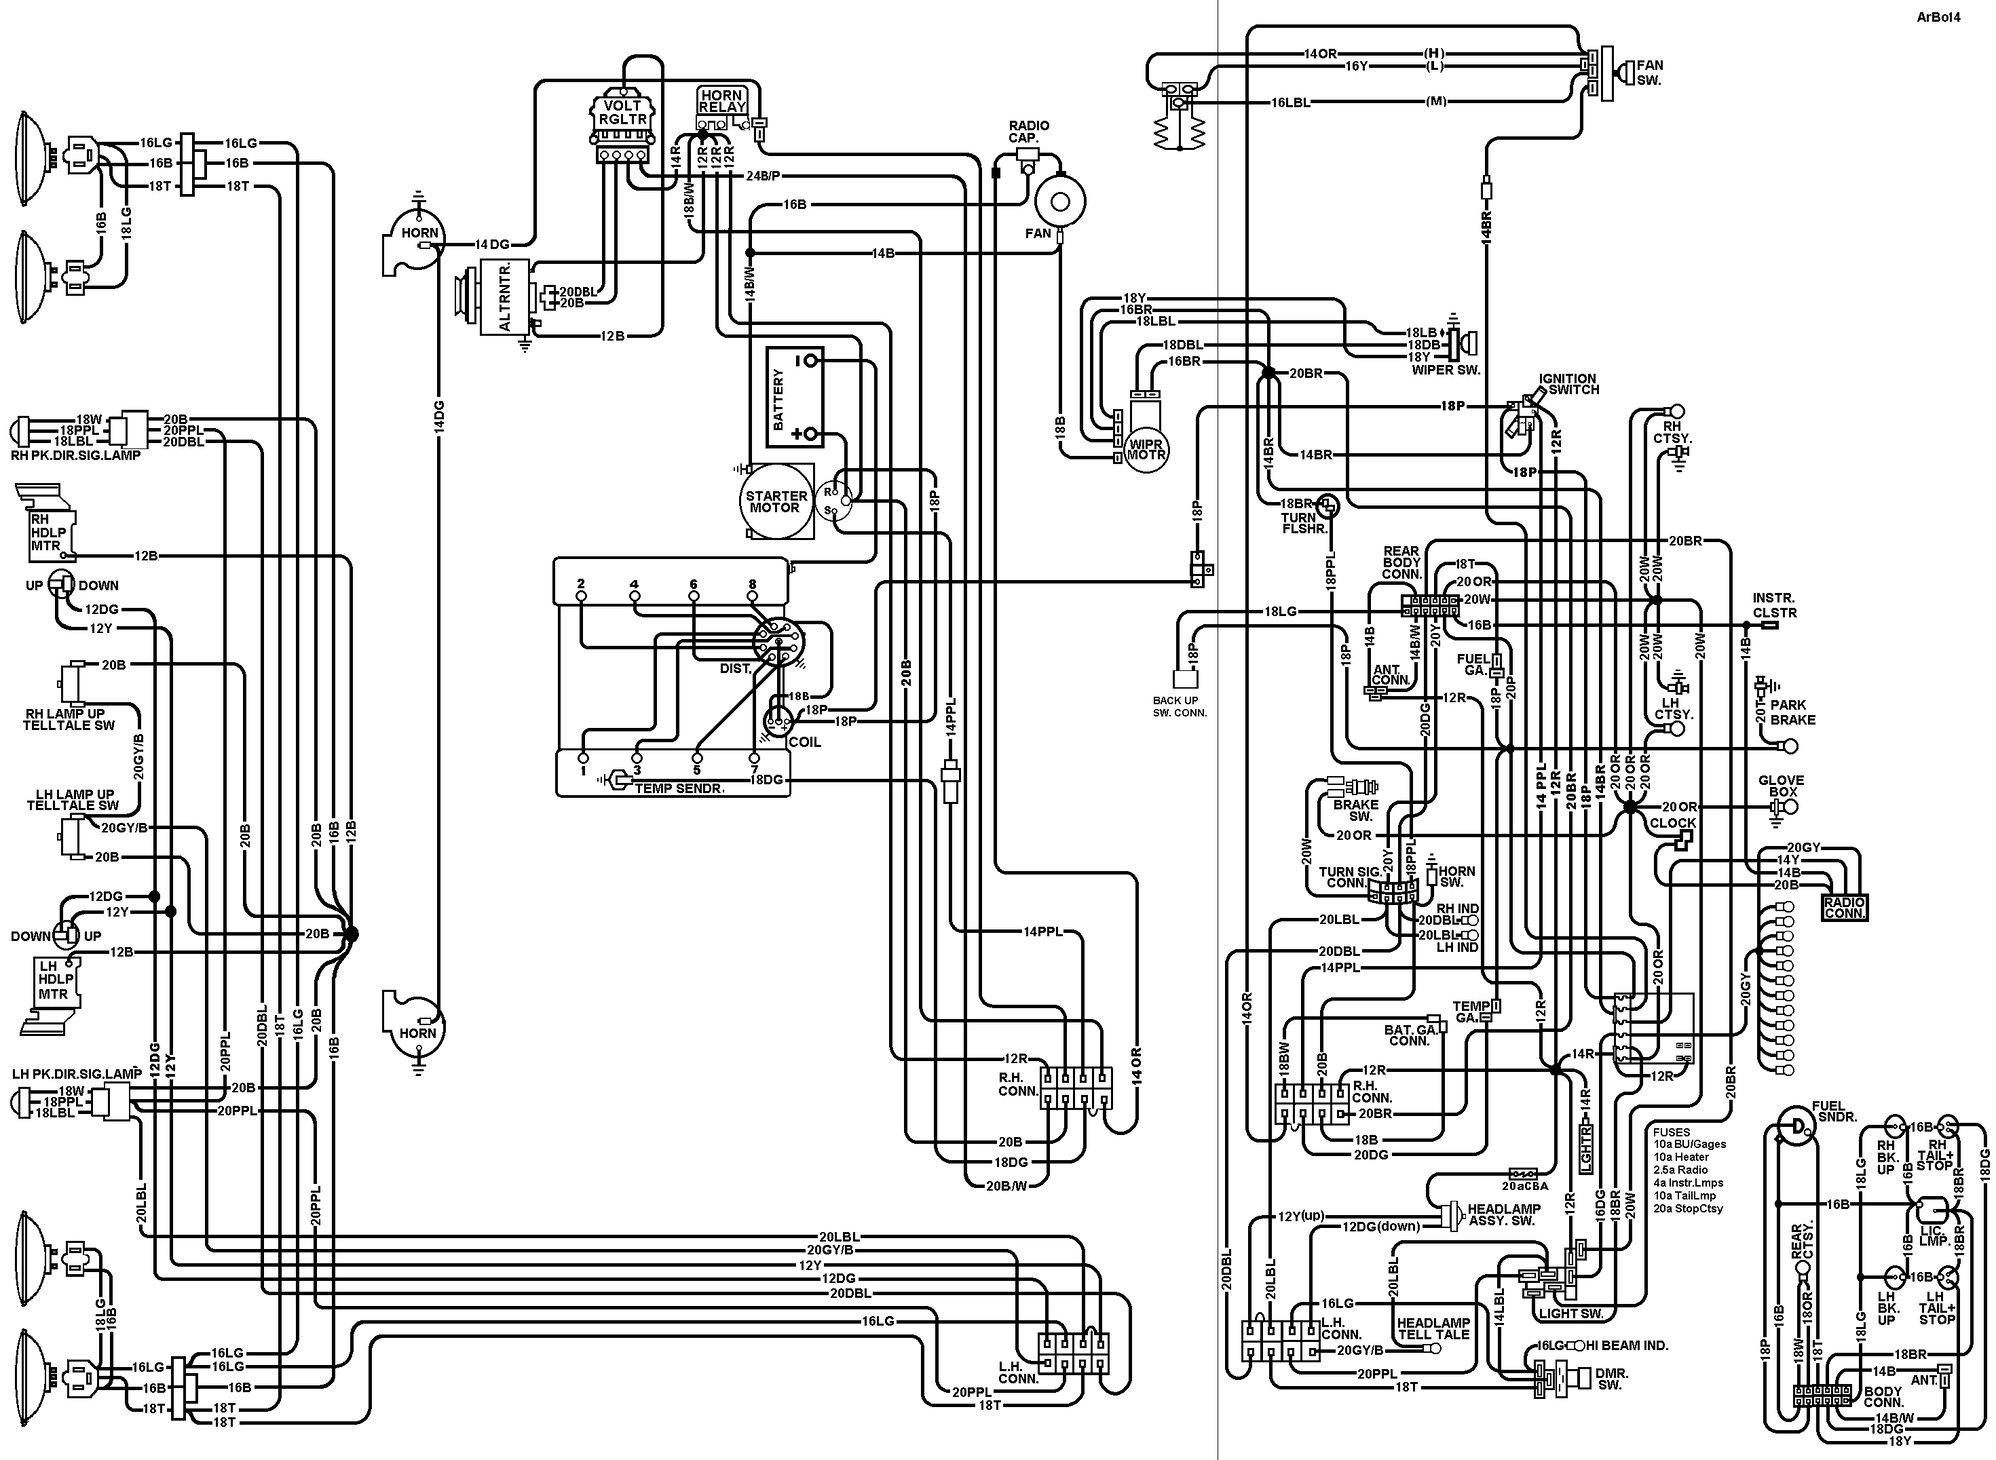 hight resolution of 1966 corvette ac wiring diagram data schema1966 coupe ac blower corvetteforum chevrolet corvette forum 1966 corvette